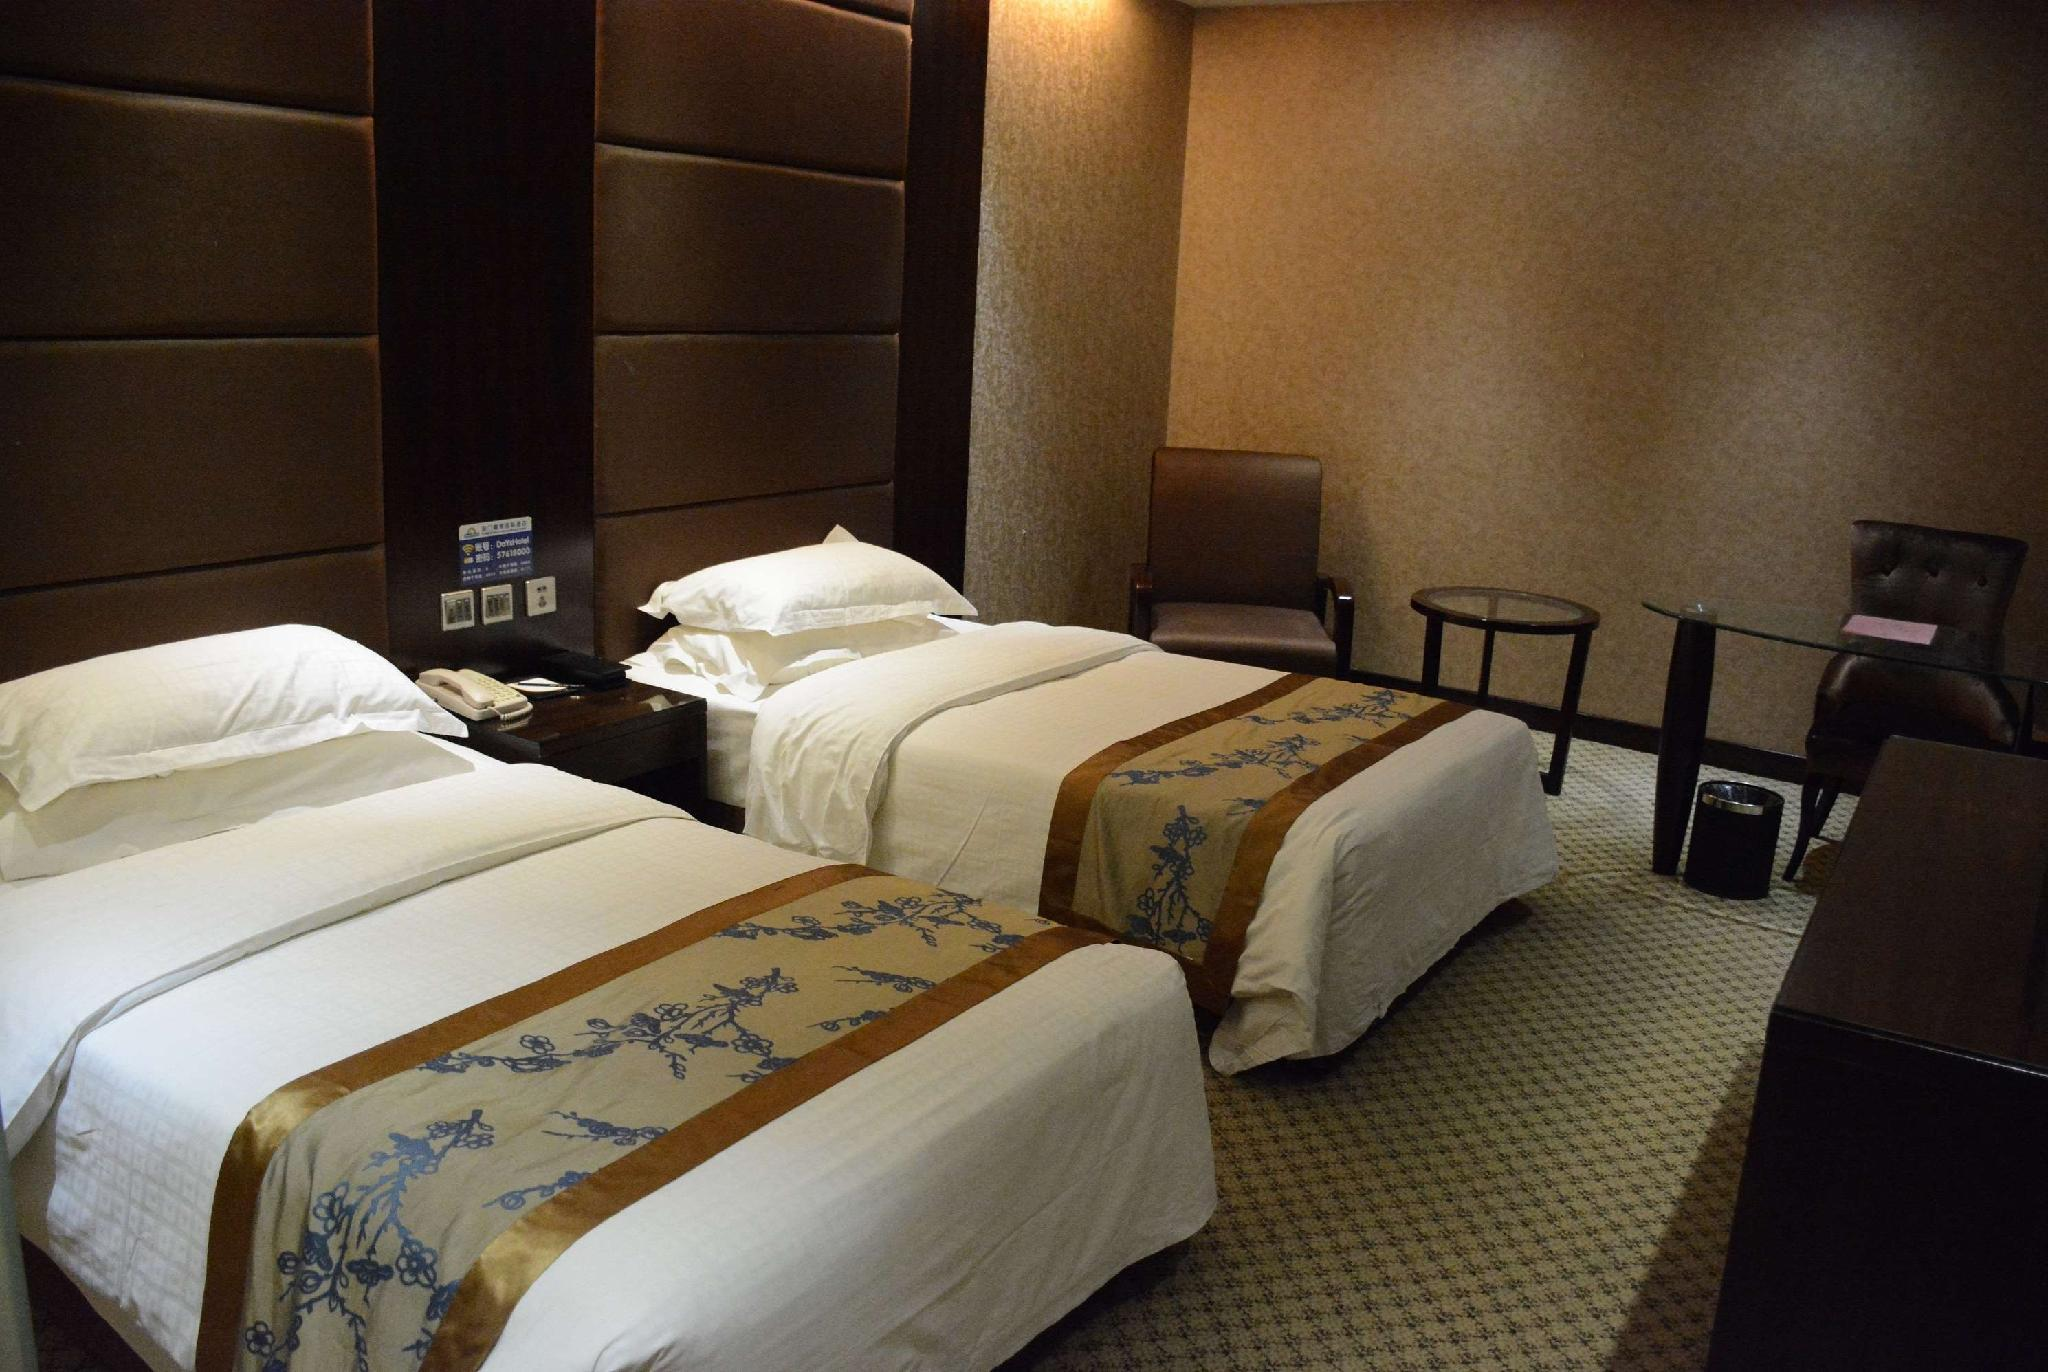 Days Hotel Guomen, Beijing